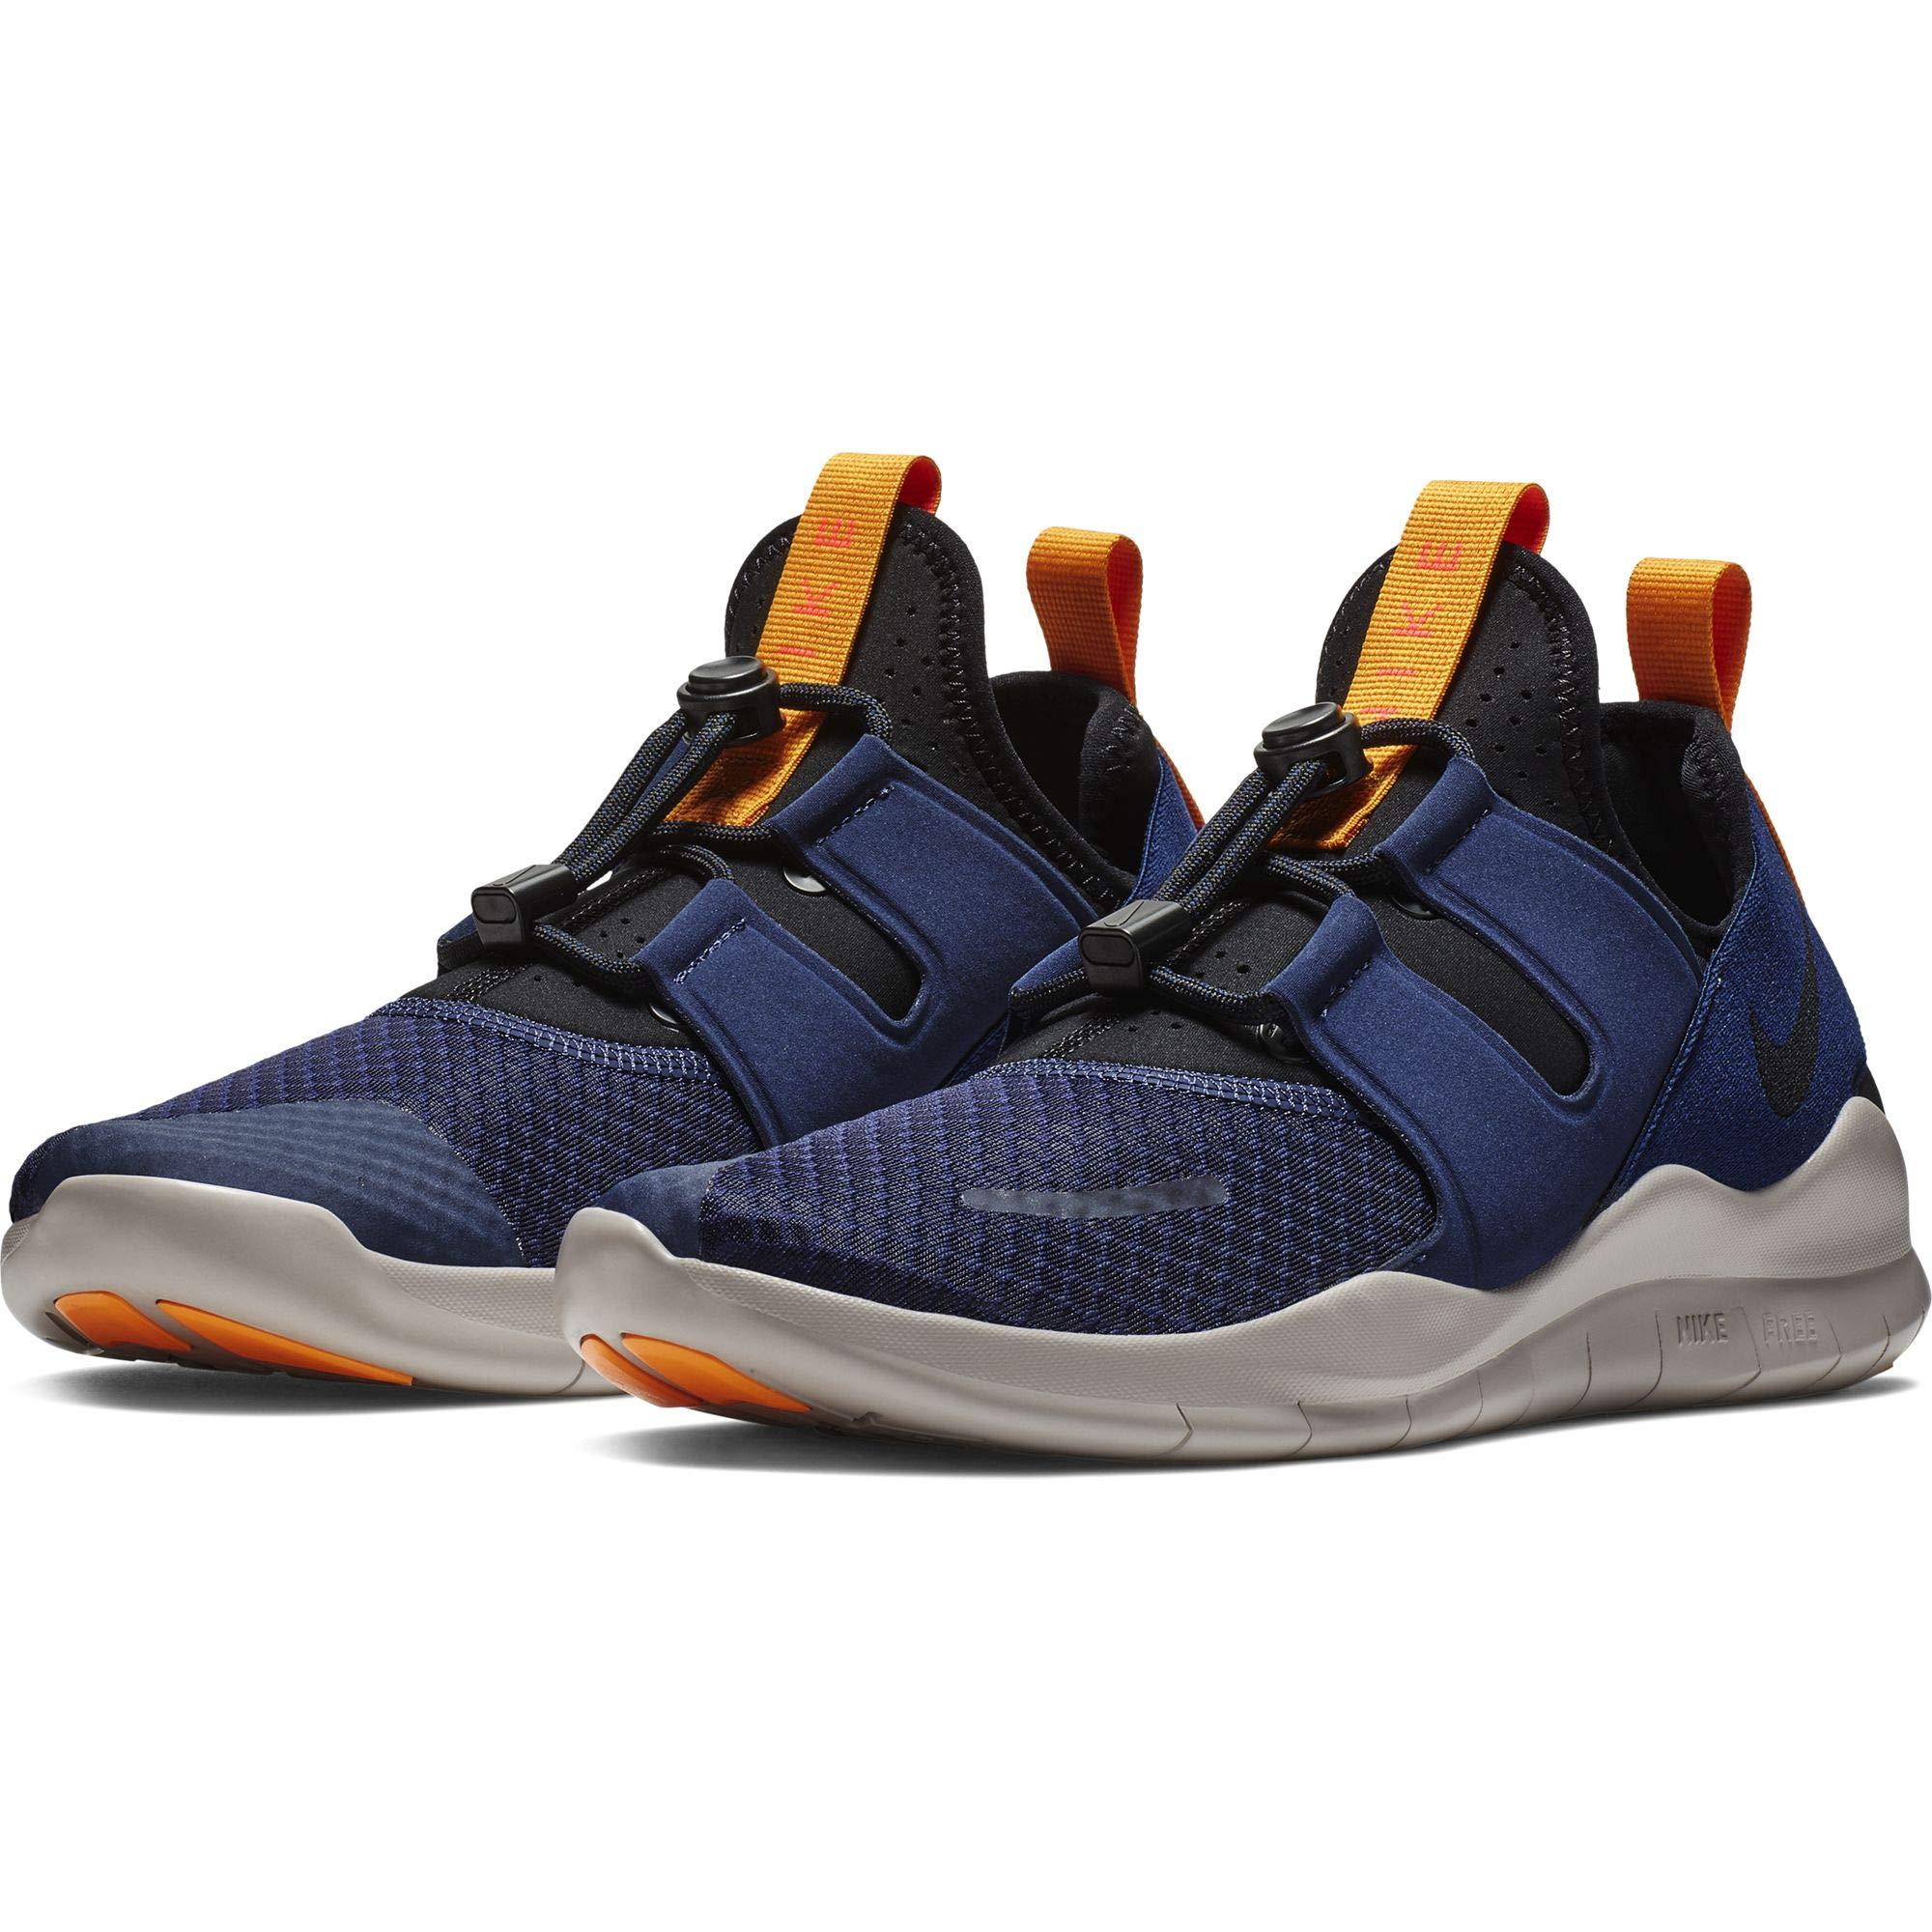 c457aca70276 Galleon - Nike Men s Free RN Commuter 2018 Running Shoe